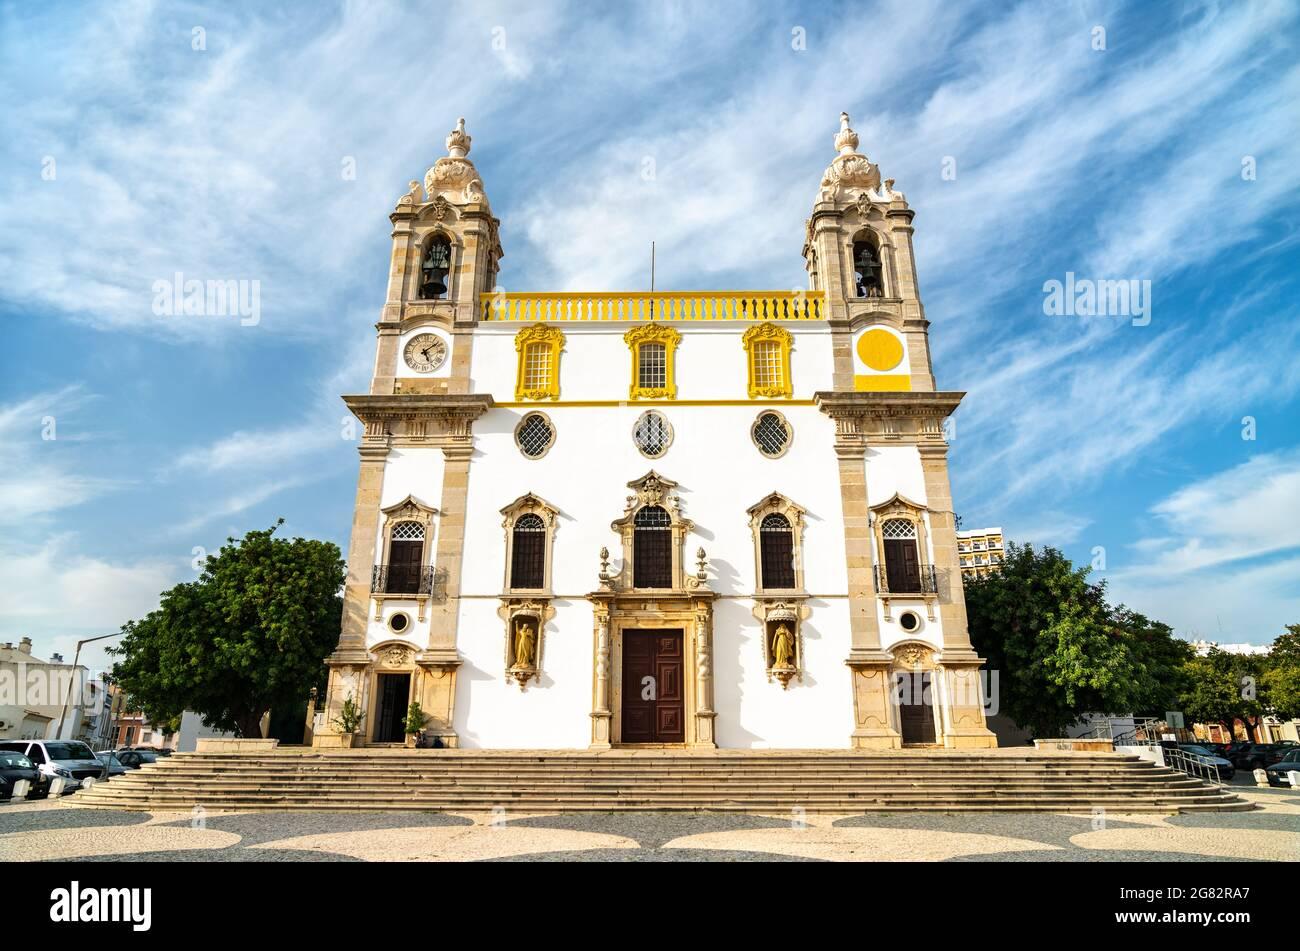 Igreja do Carmo, une église de Faro, Portugal Banque D'Images